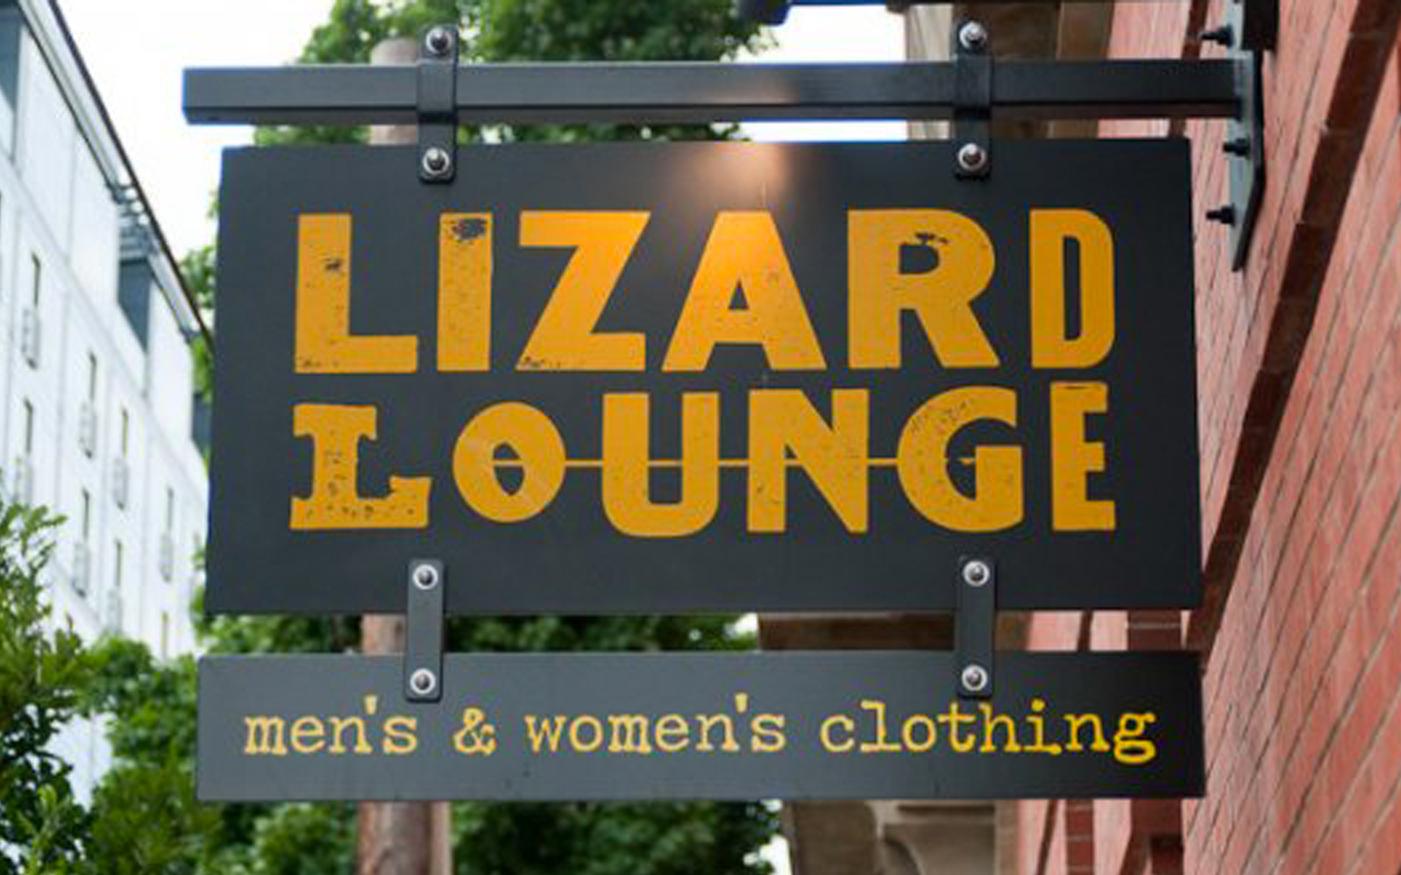 Lizard lounge 2